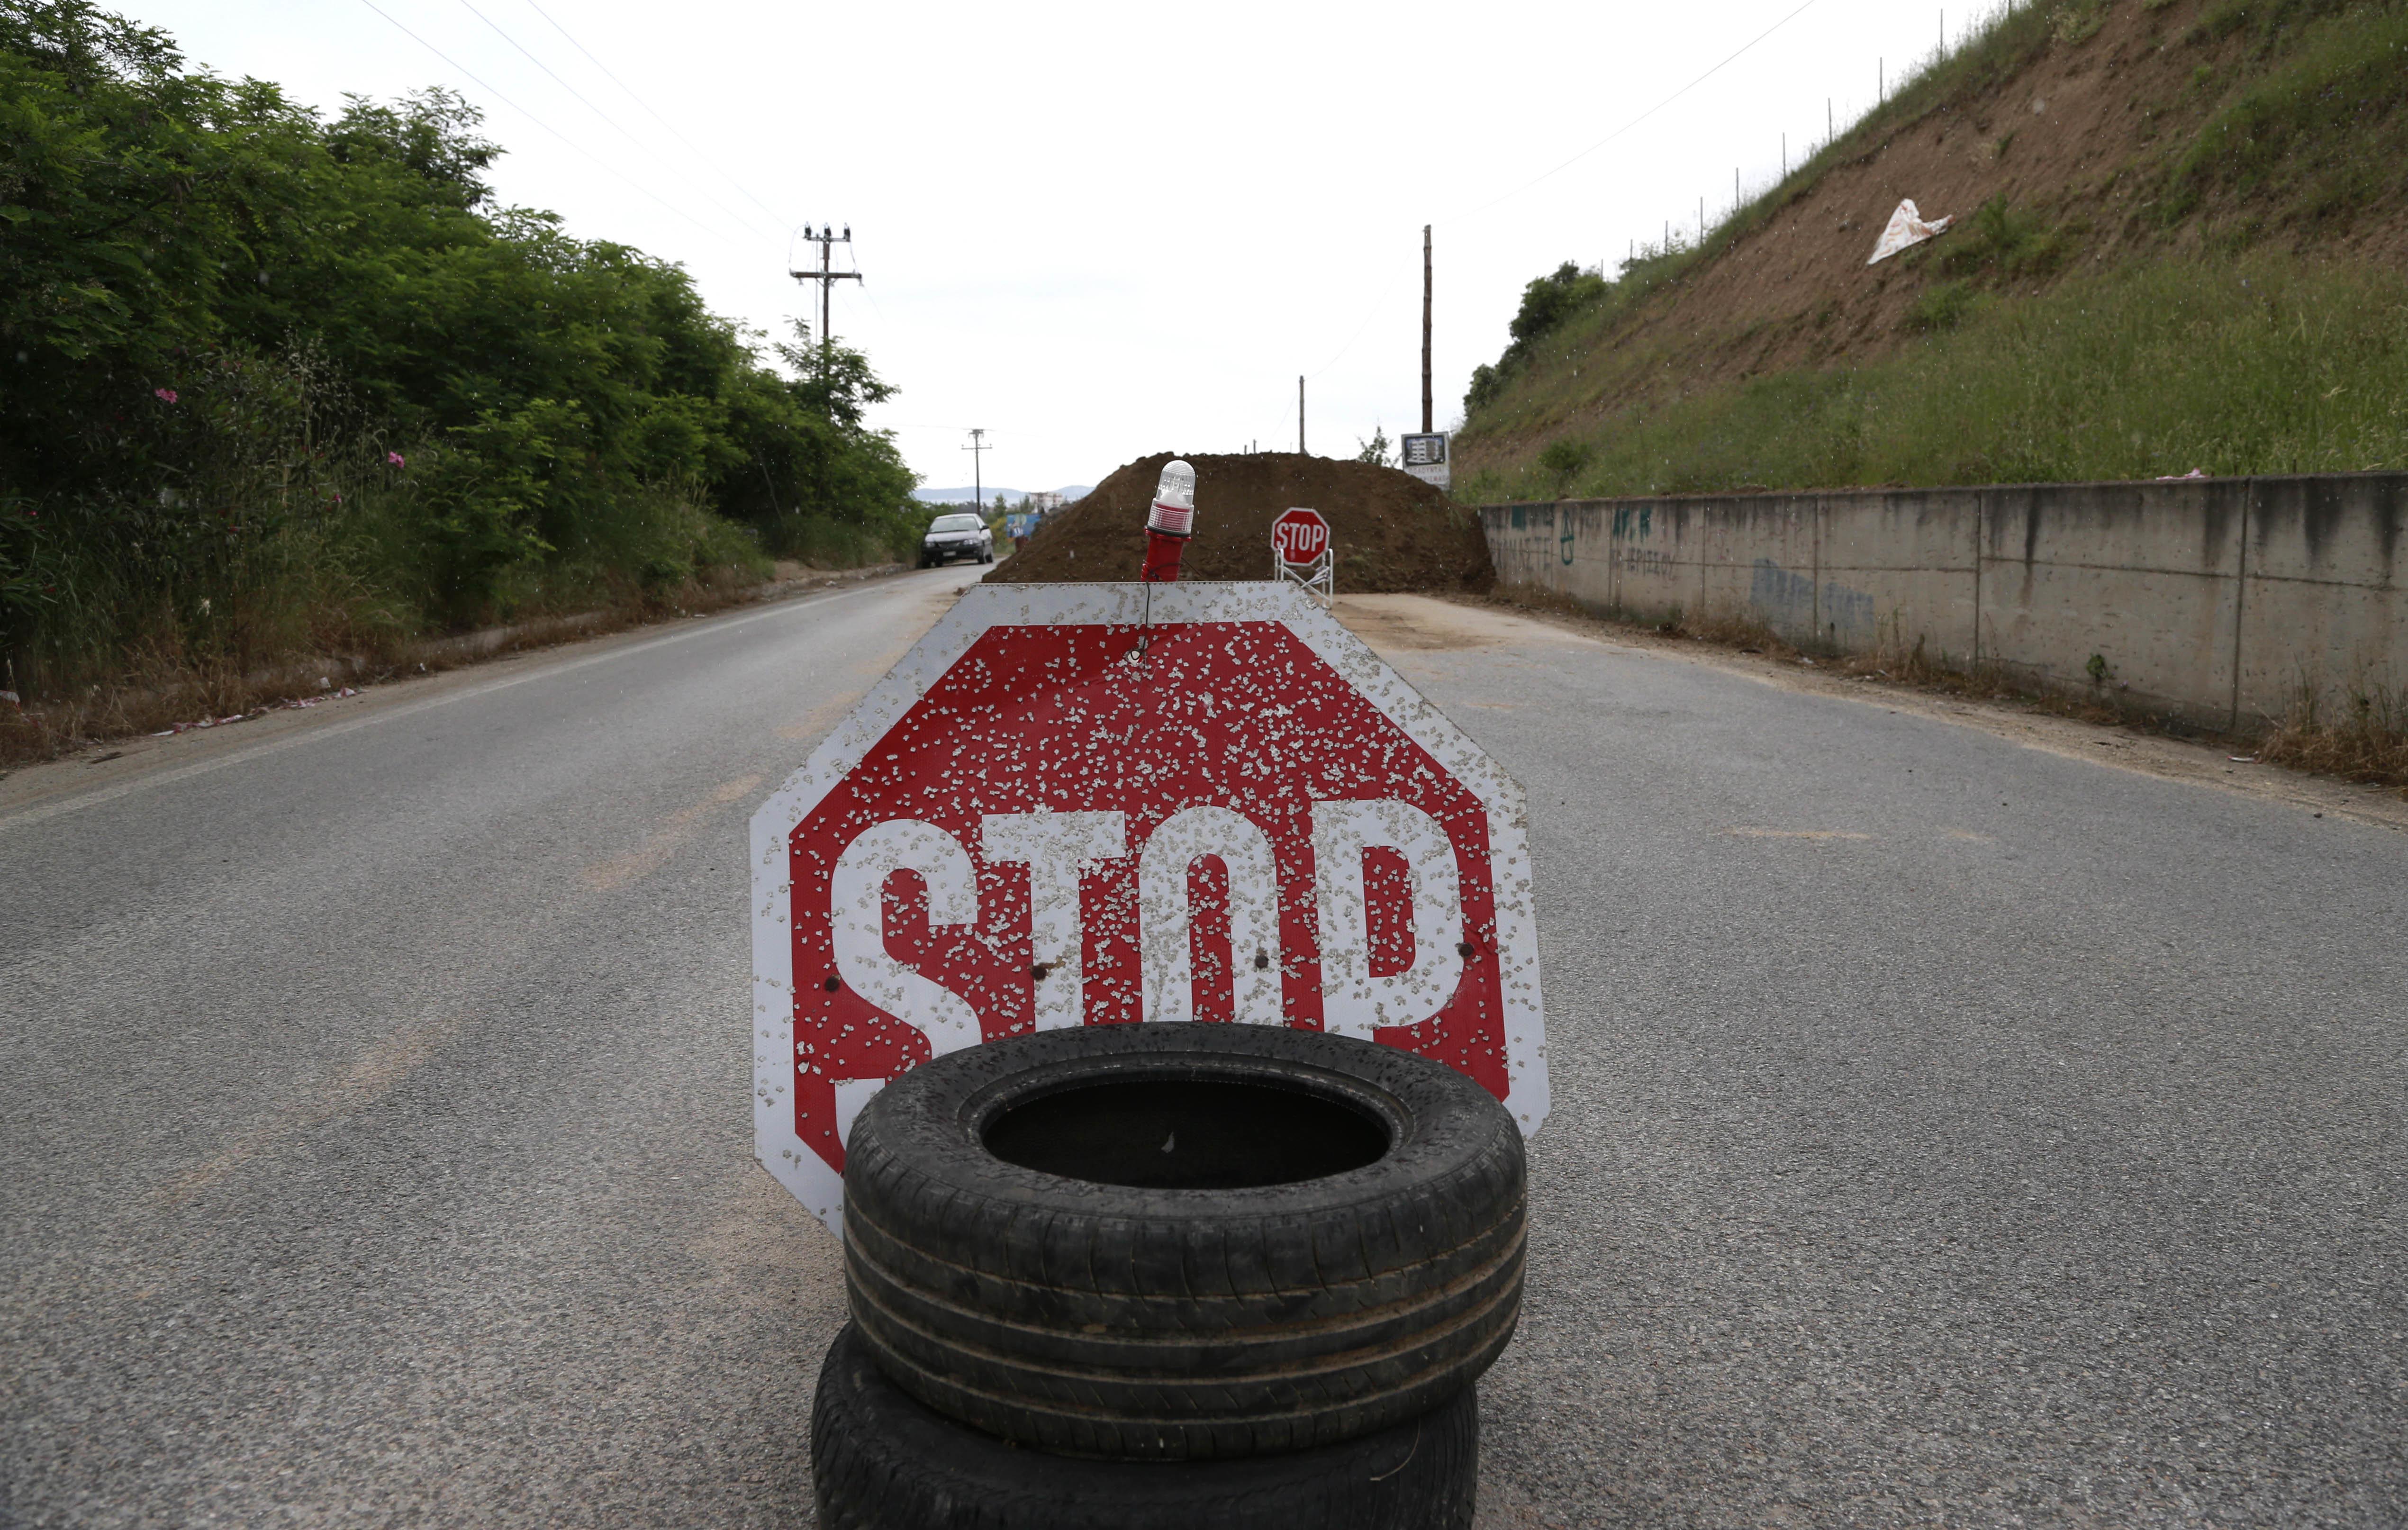 STOP: Χιλιάδες υποψήφιοι οδηγοί στην «ουρά» λόγω απεργίας των εξεταστών